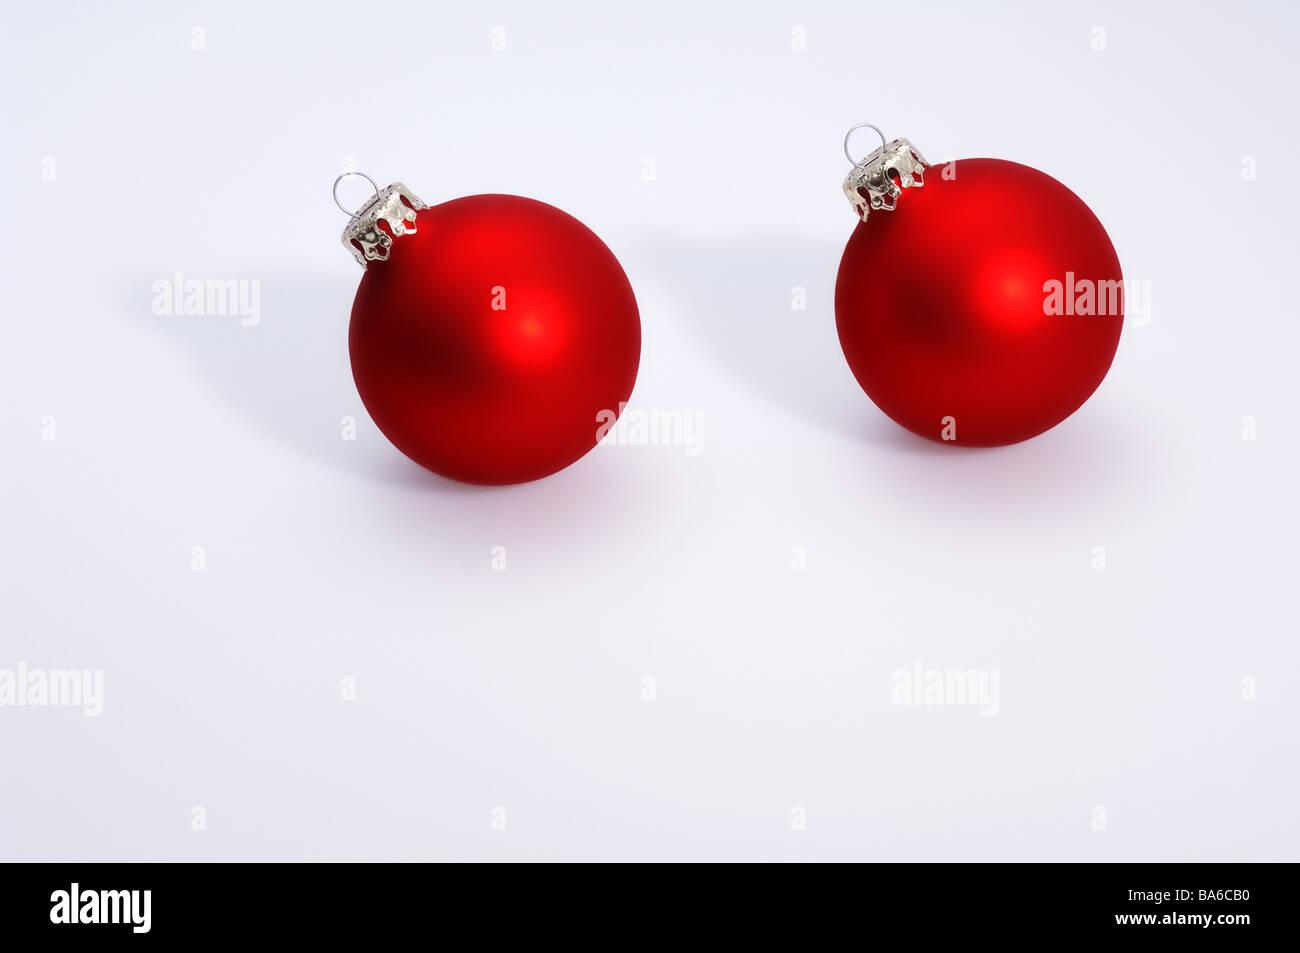 Christmas Christian Tree Balls Red Balls Glass Stock Photos ...